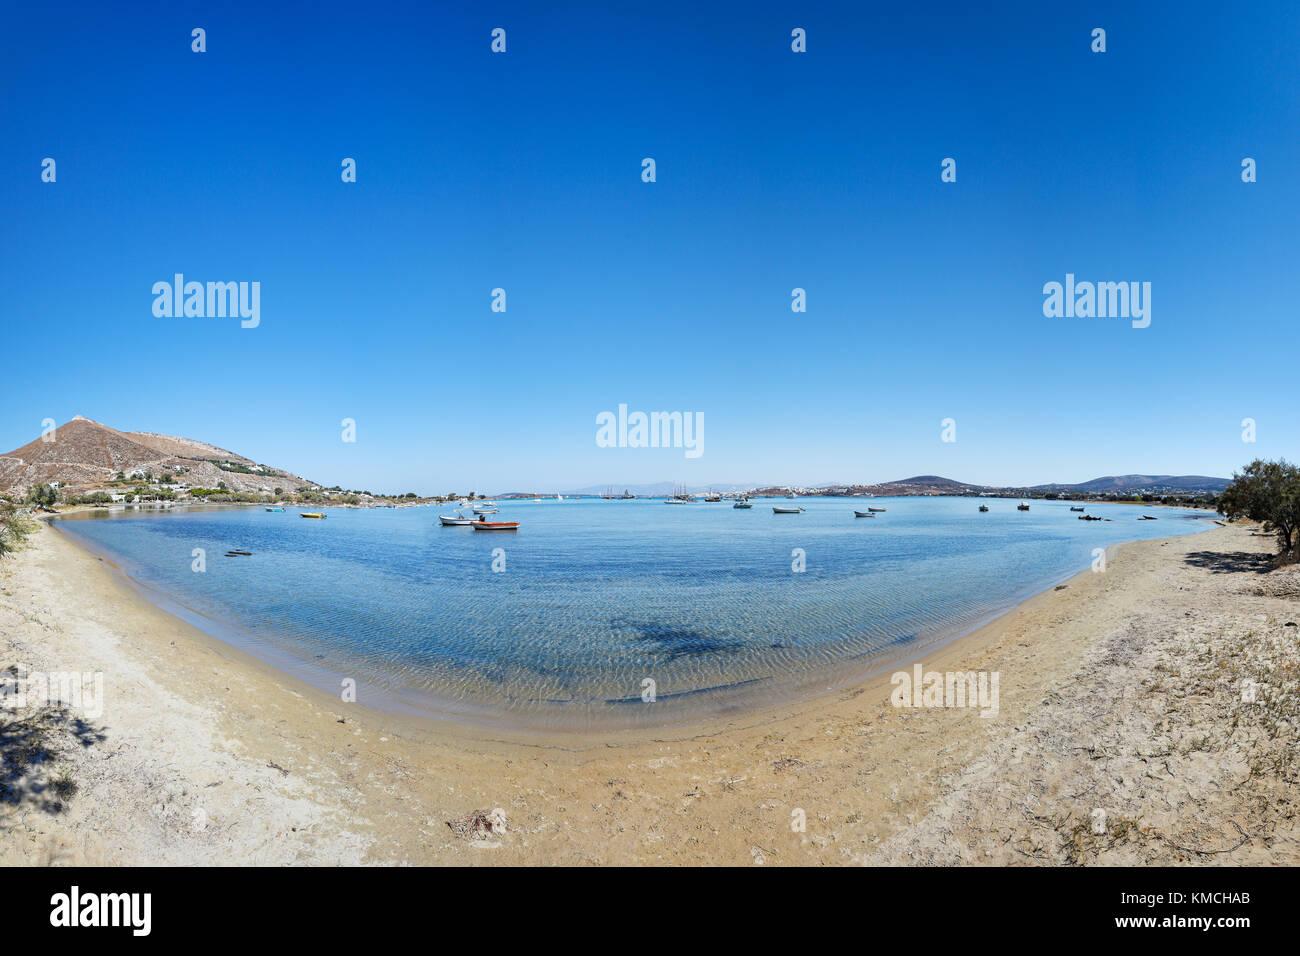 Kolymbithres beach de l'île de paros, Grèce Photo Stock